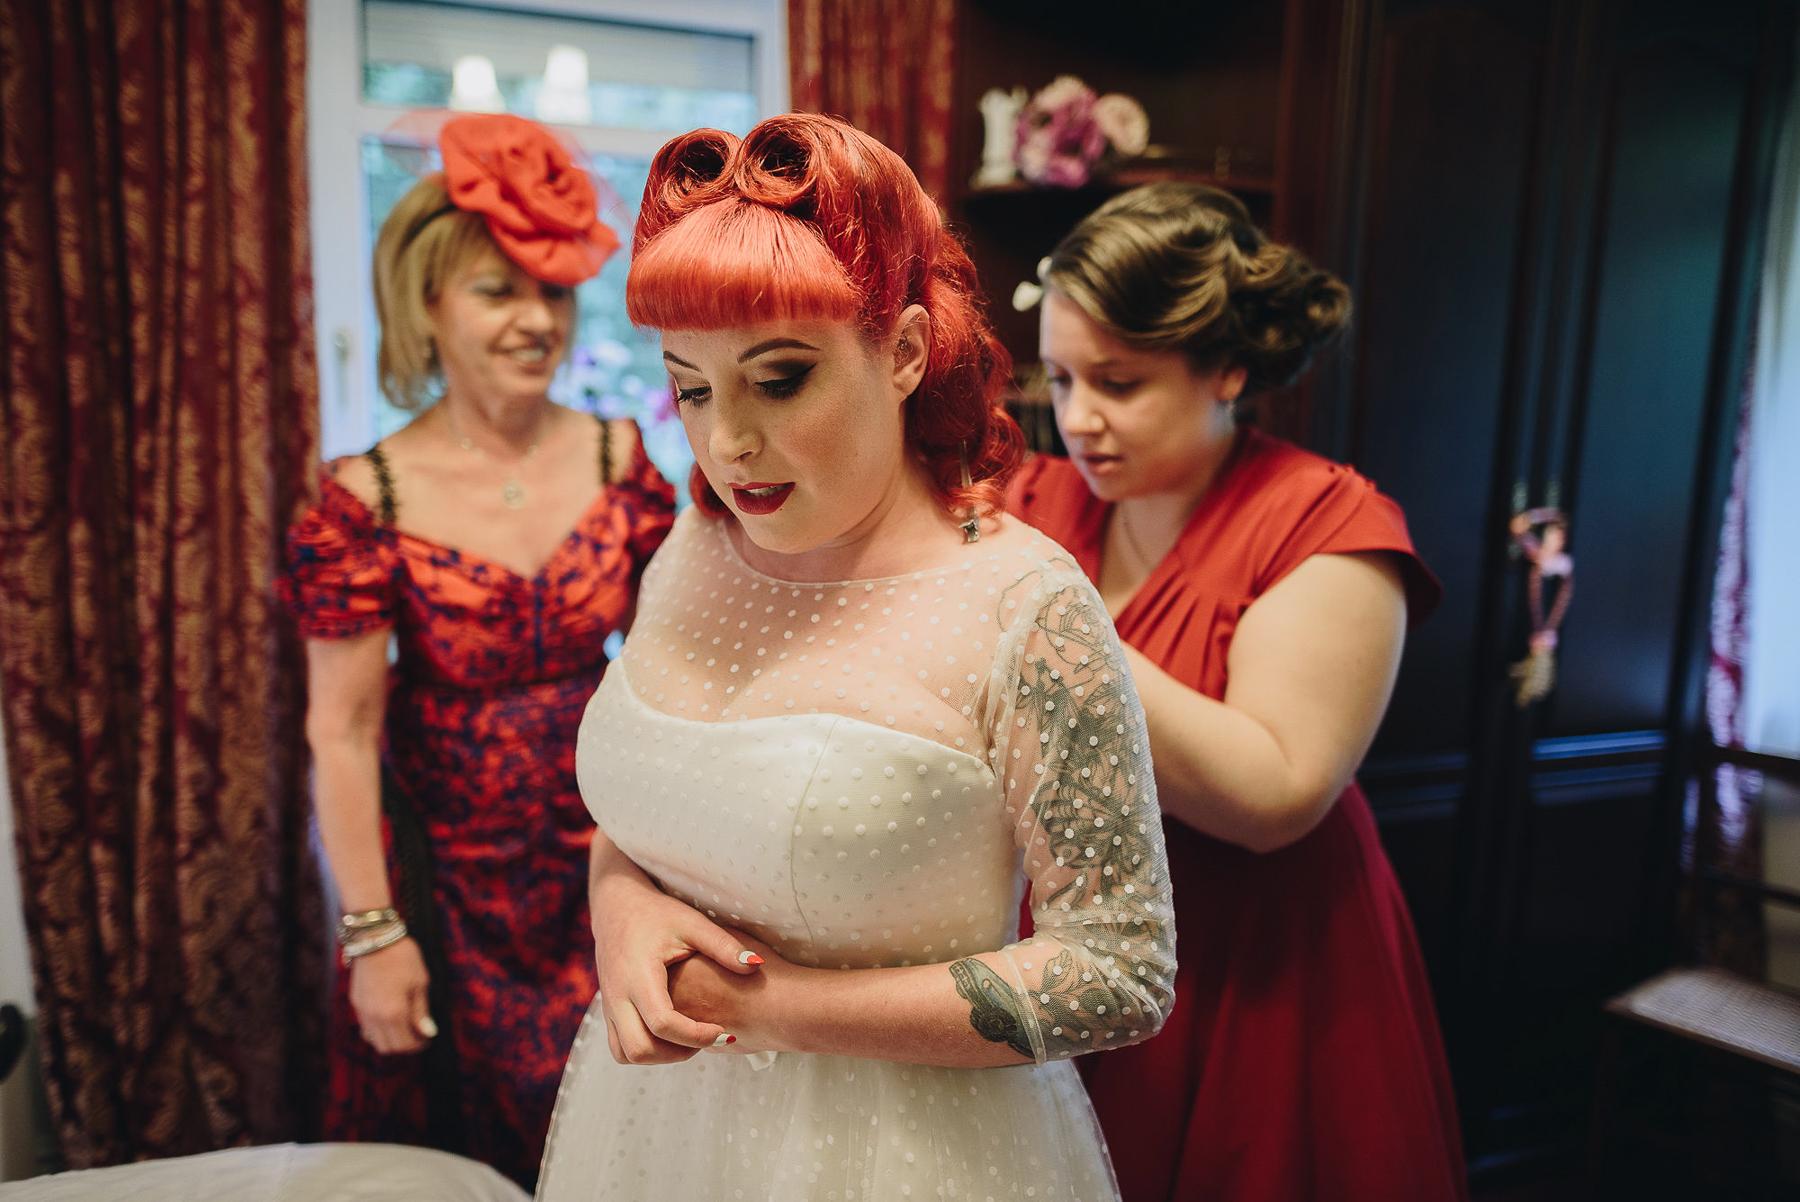 Wellbeing_Farm_Wedding_Photography_The_Pin-Up_Bride_Lara_Shaun-31.jpg